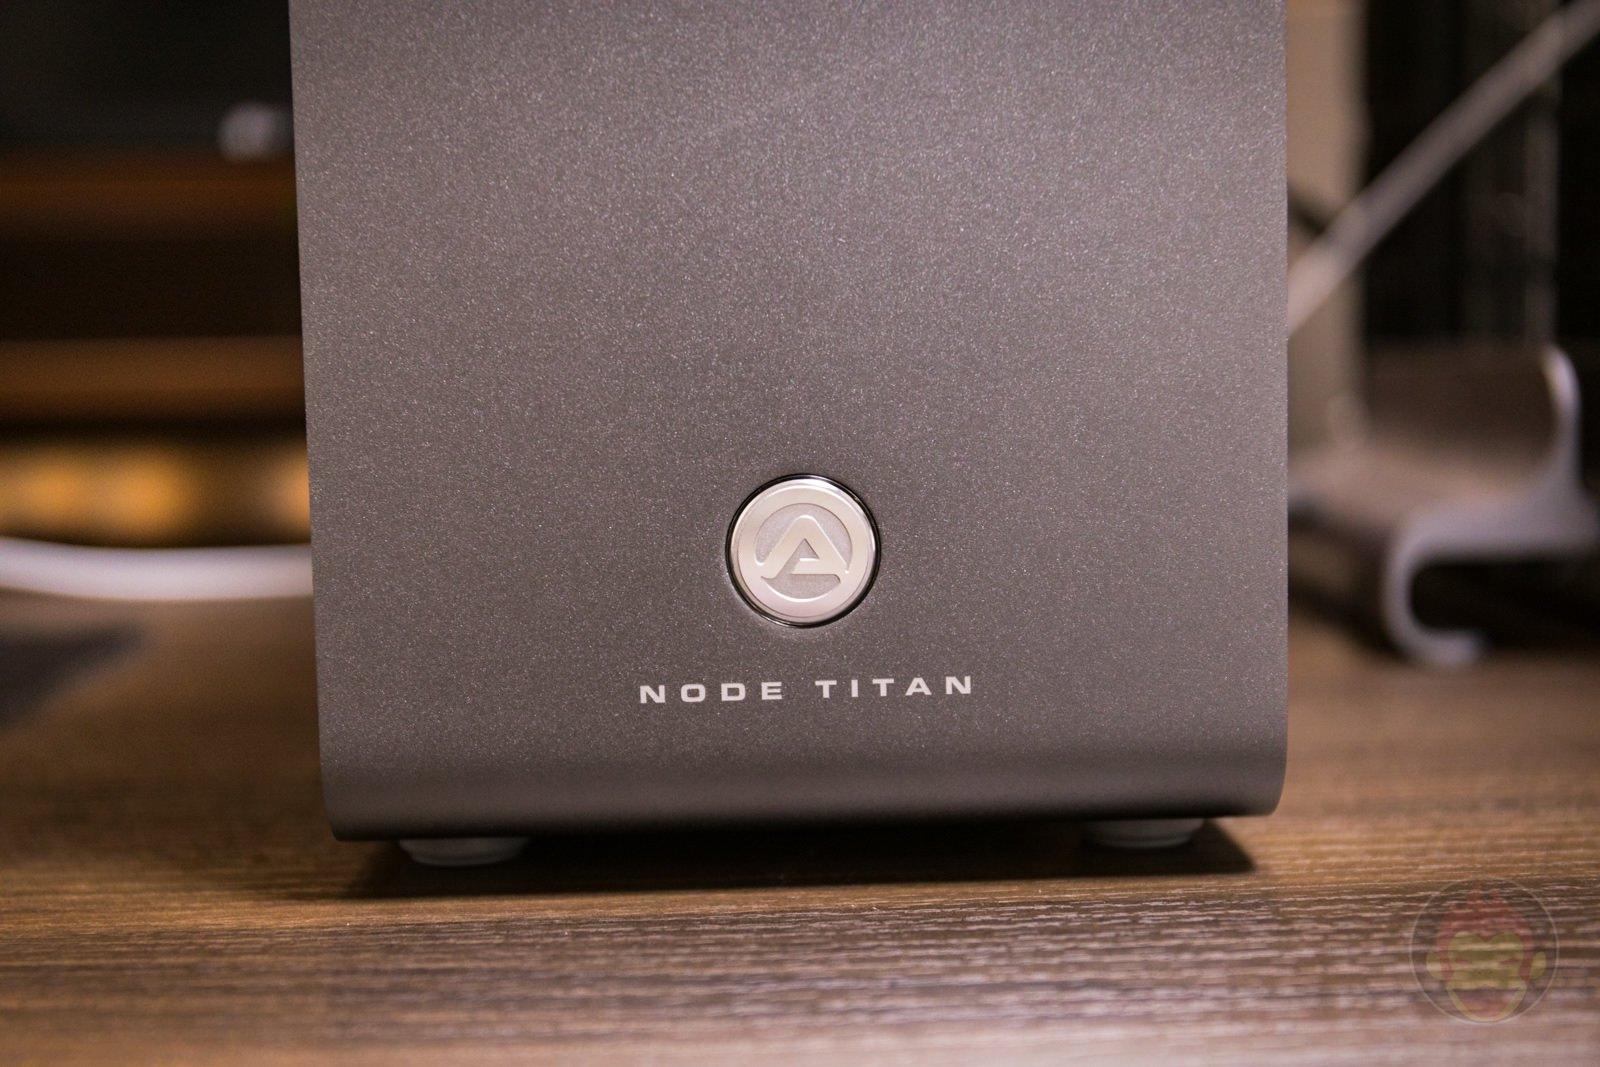 AKiTiO Node Titan with msi AMD Radeon RX 5700 XT Review 02